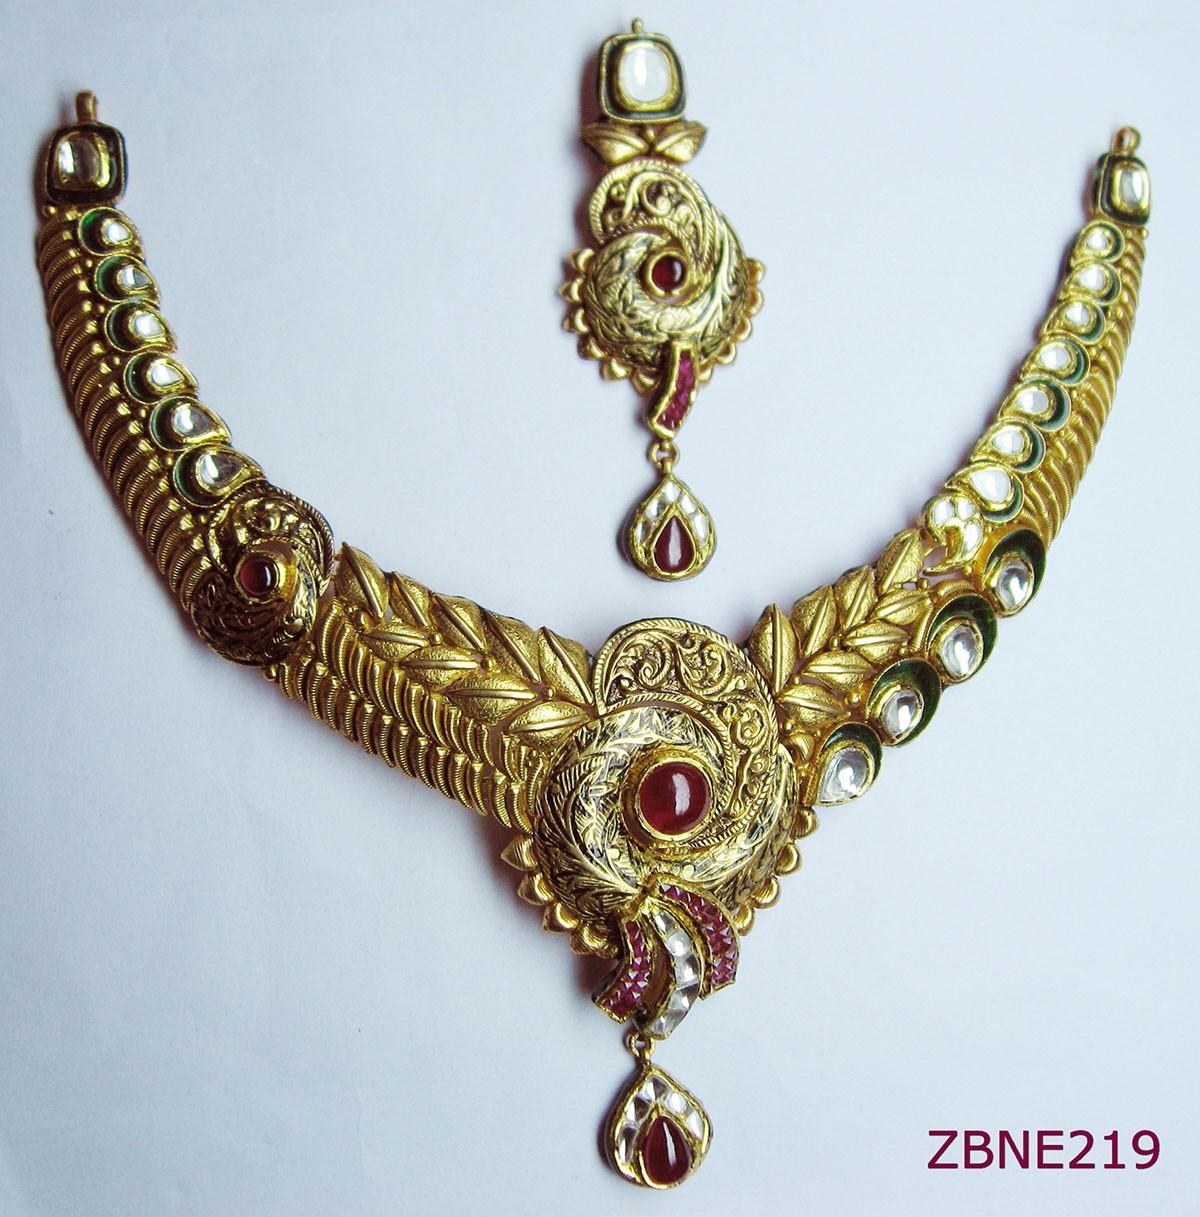 ZBNE219